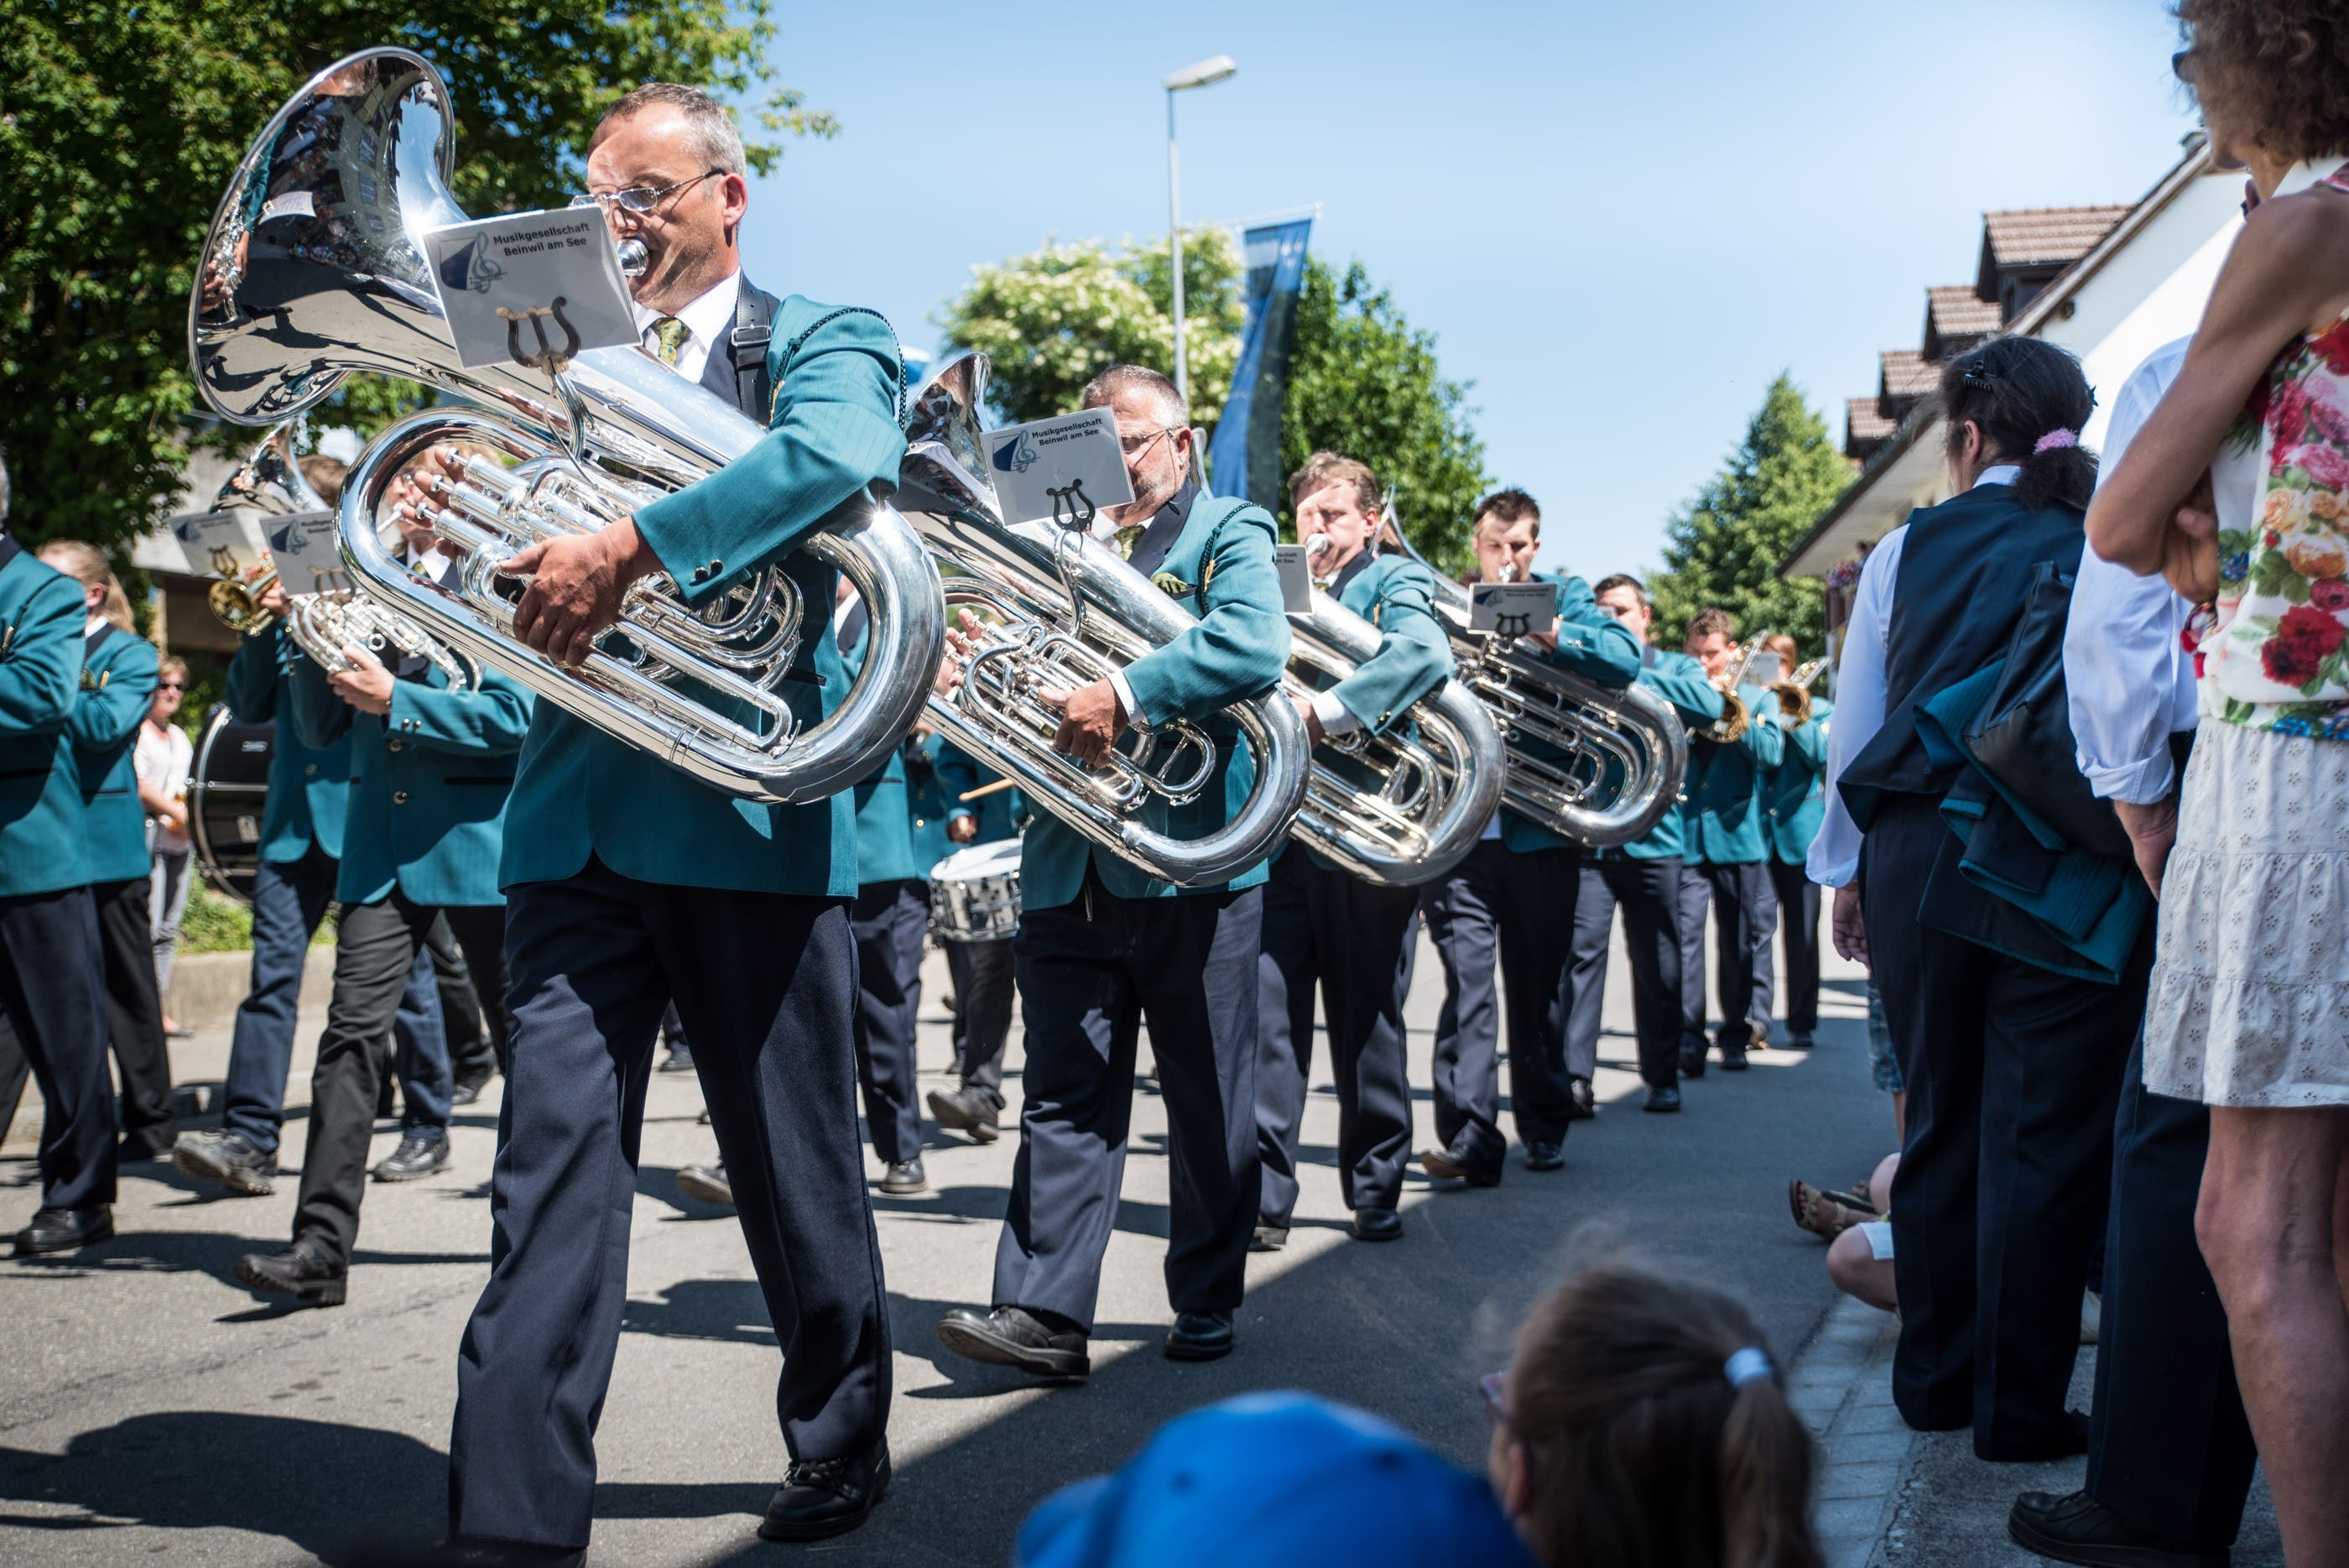 Musikgesellschaft Beinwil am See